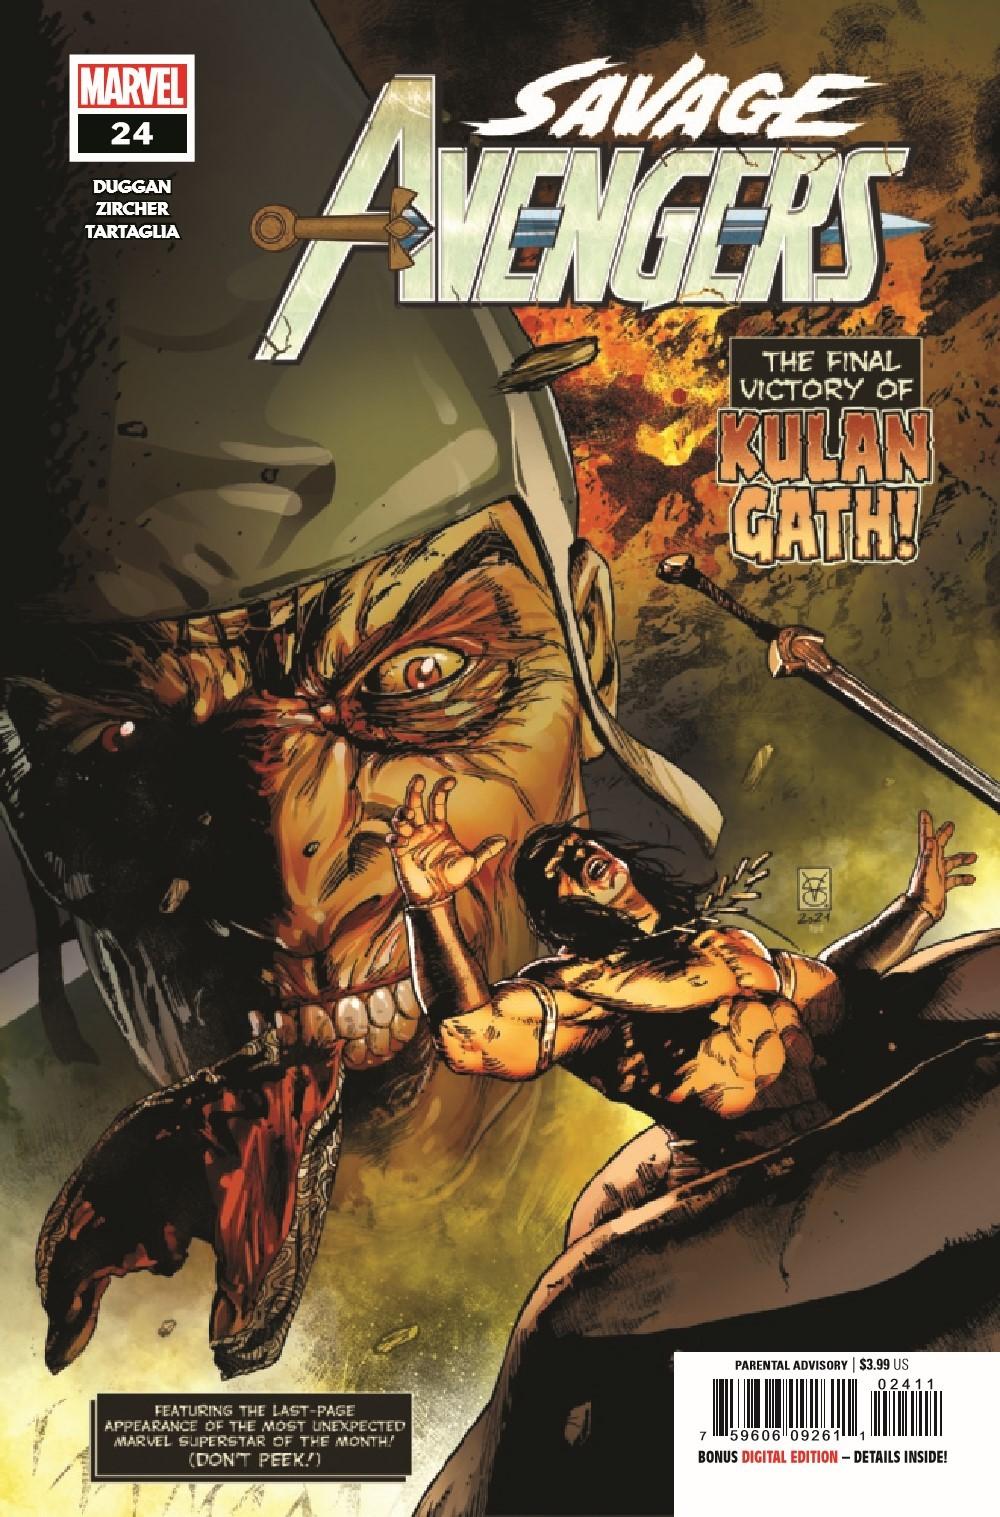 SAVAVEN2019024_Preview-1 ComicList Previews: SAVAGE AVENGERS #24